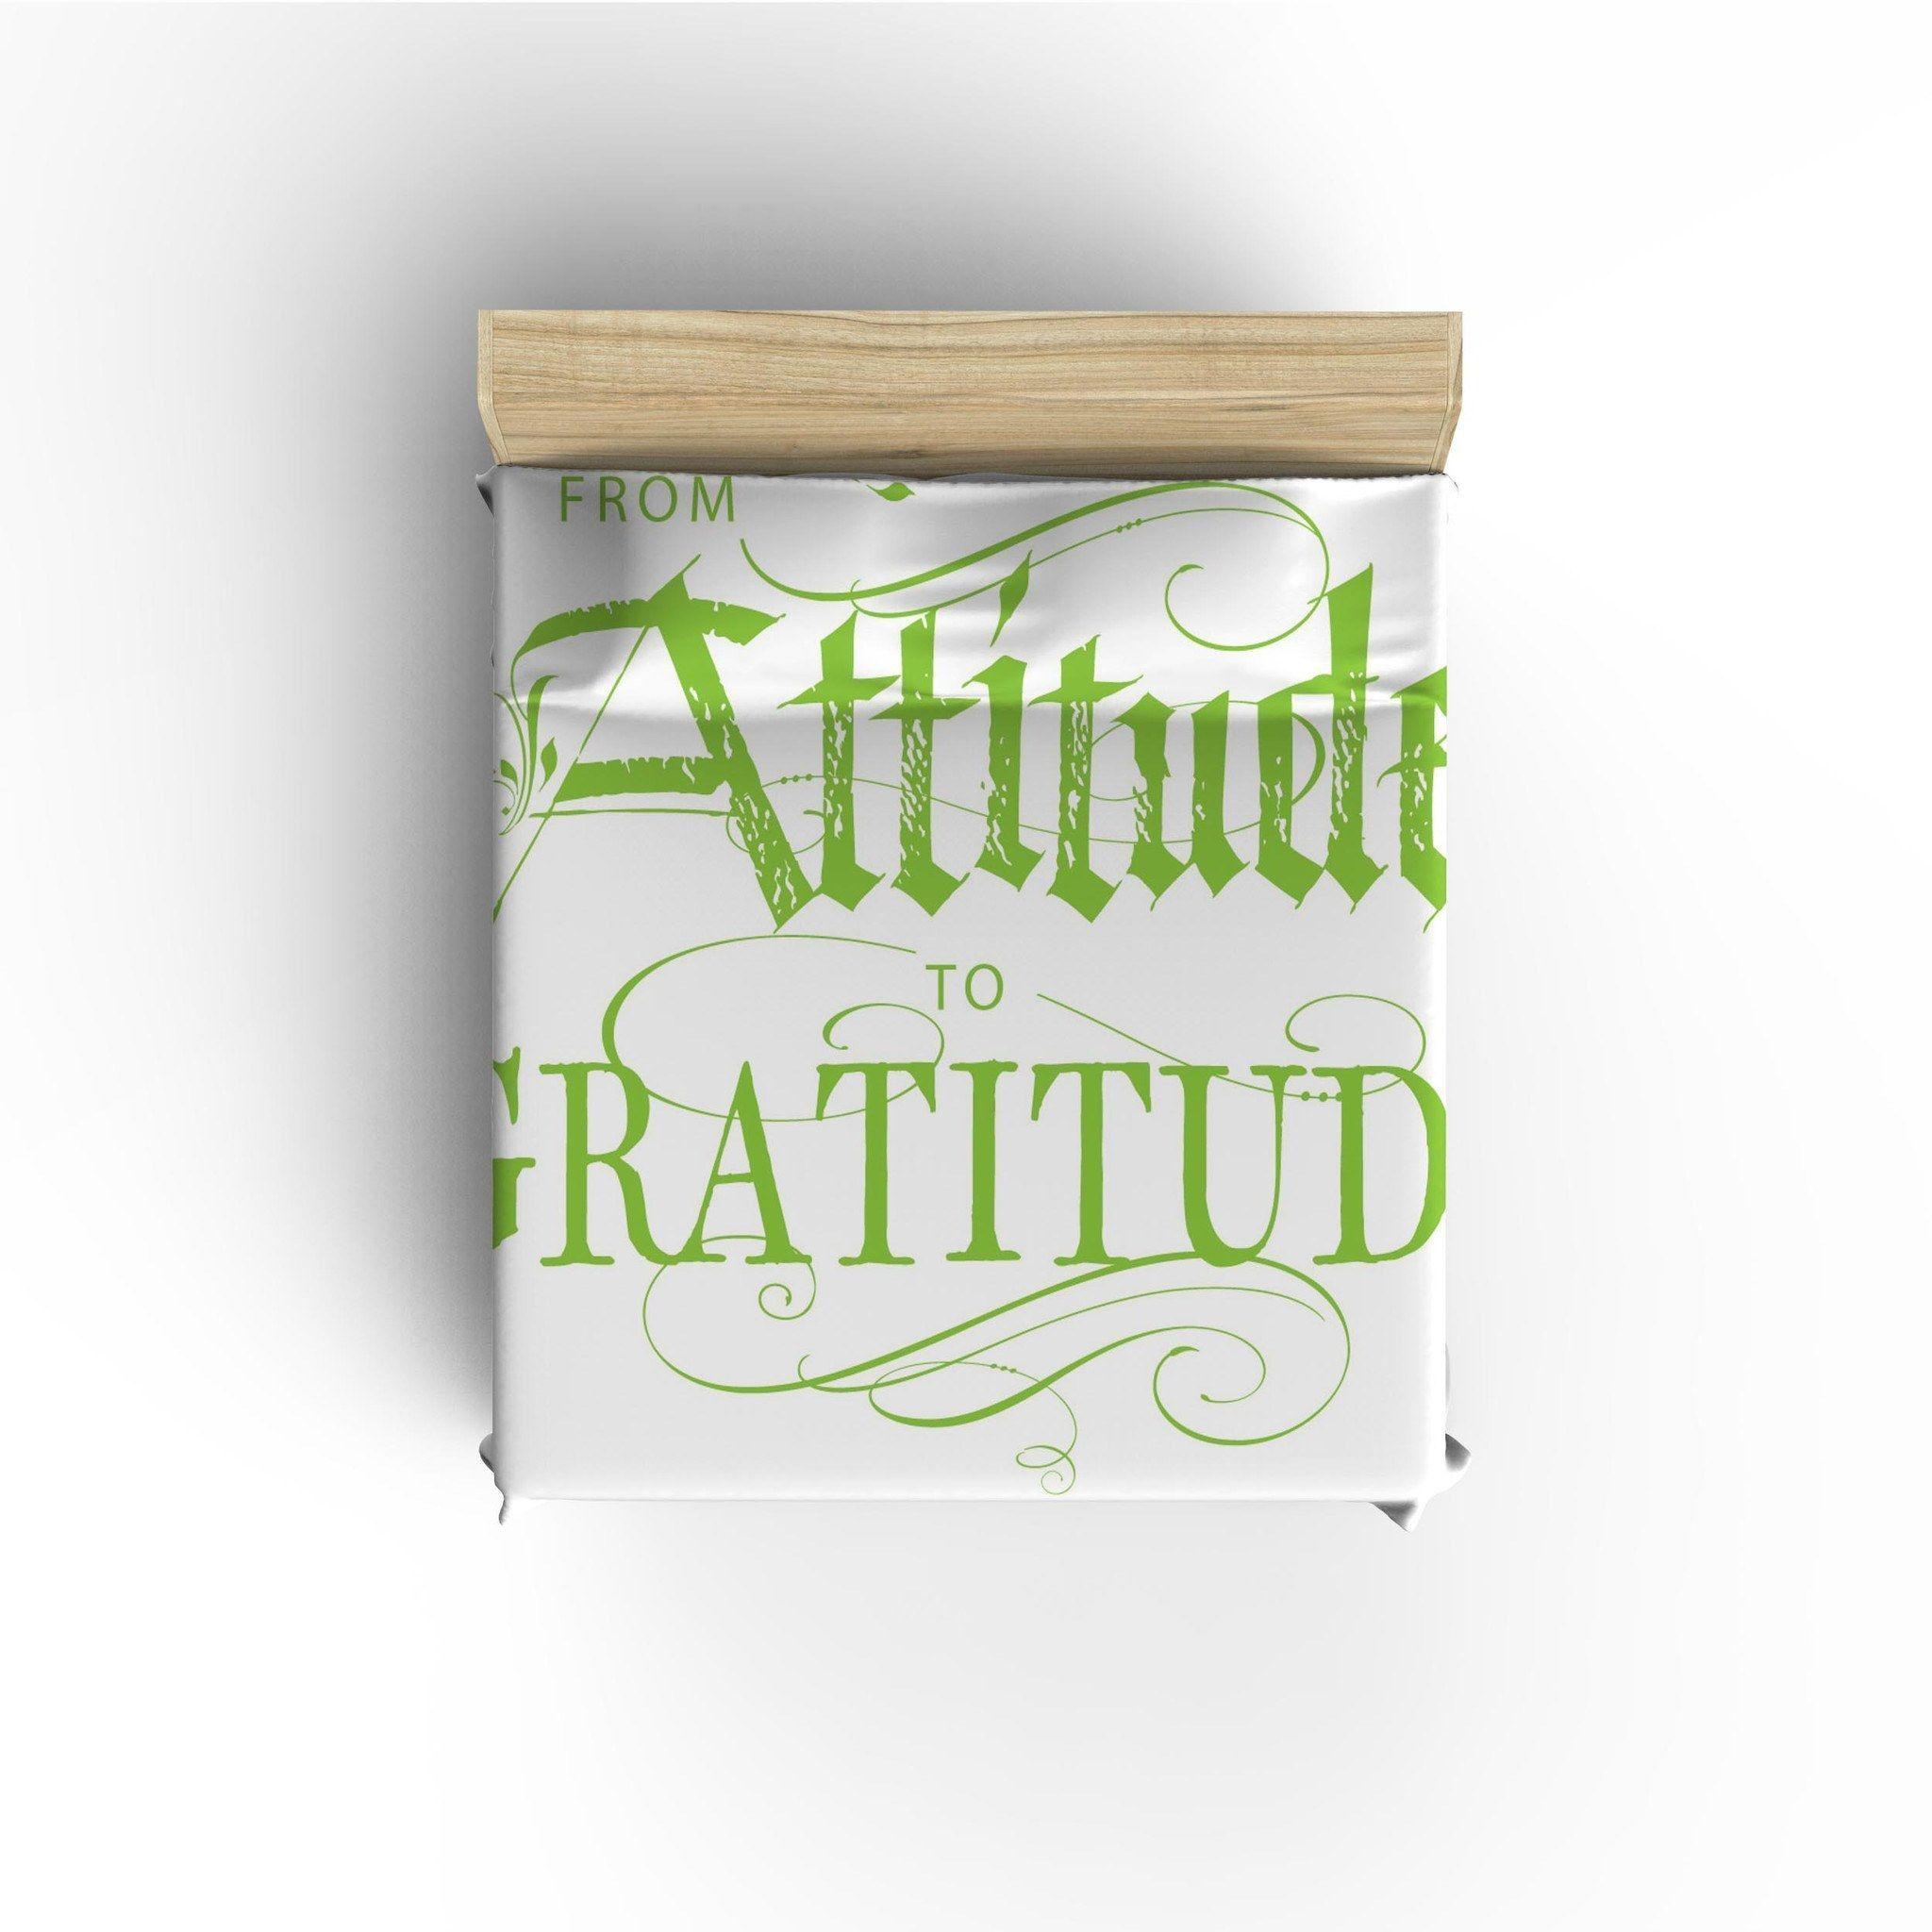 From Attitude to Gratitude'